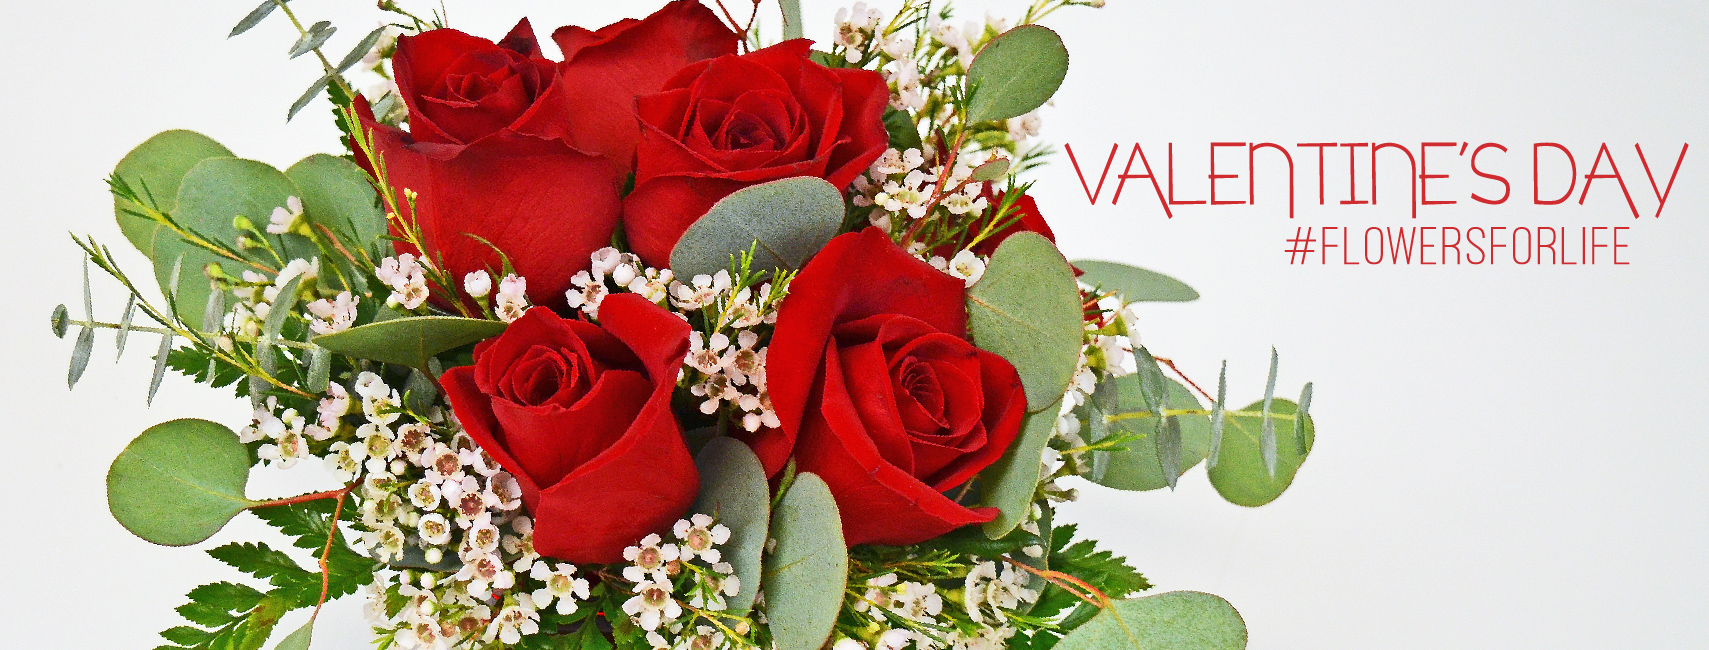 slideshowFB_Valentines2019-02